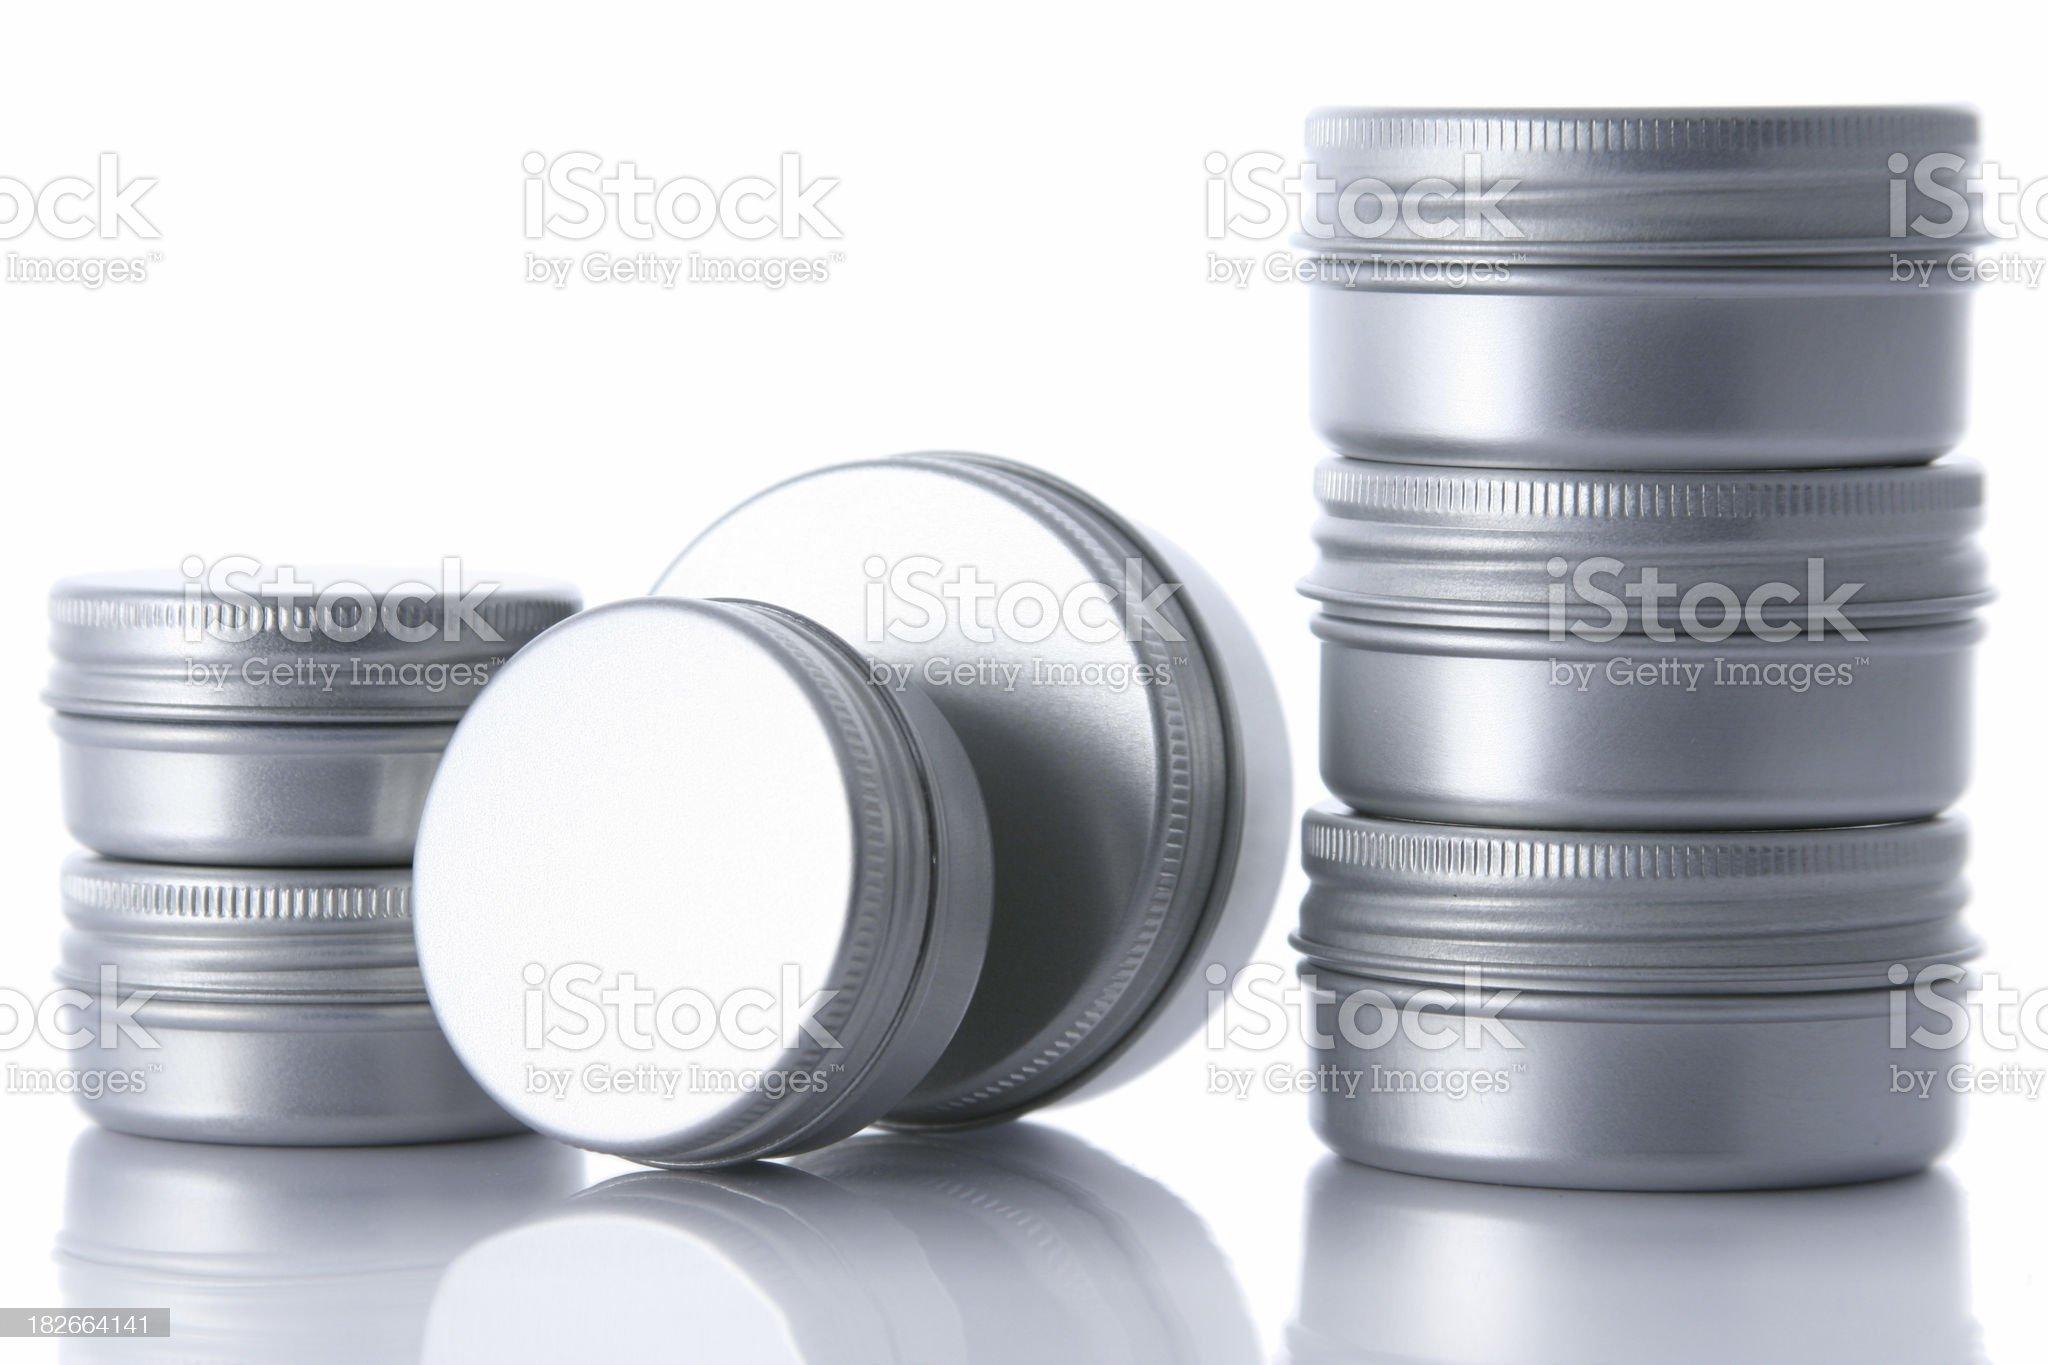 Aluminium cans [two stacks] royalty-free stock photo